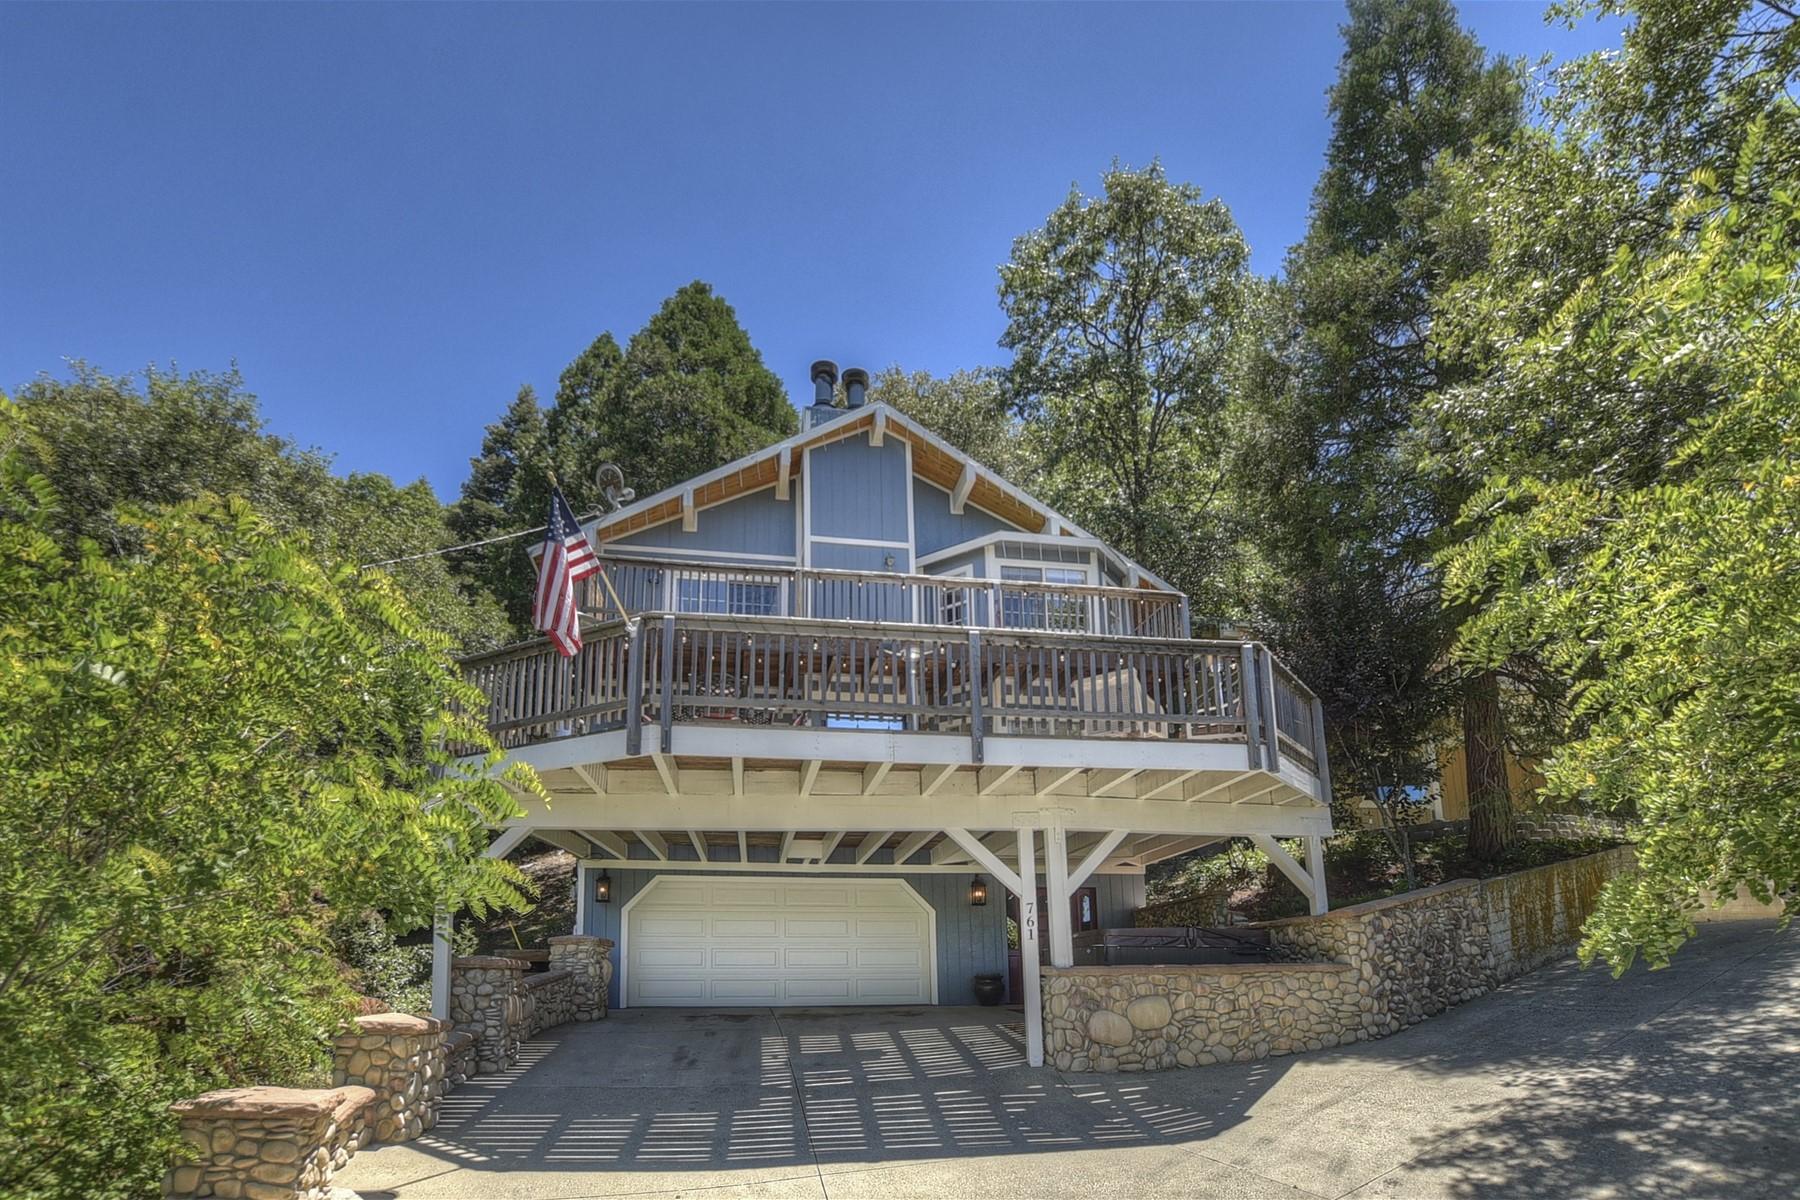 Single Family Homes for Sale at 761 Berne Drive, Crestline, CA 92325 761 Berne Drive Crestline, California 92325 United States